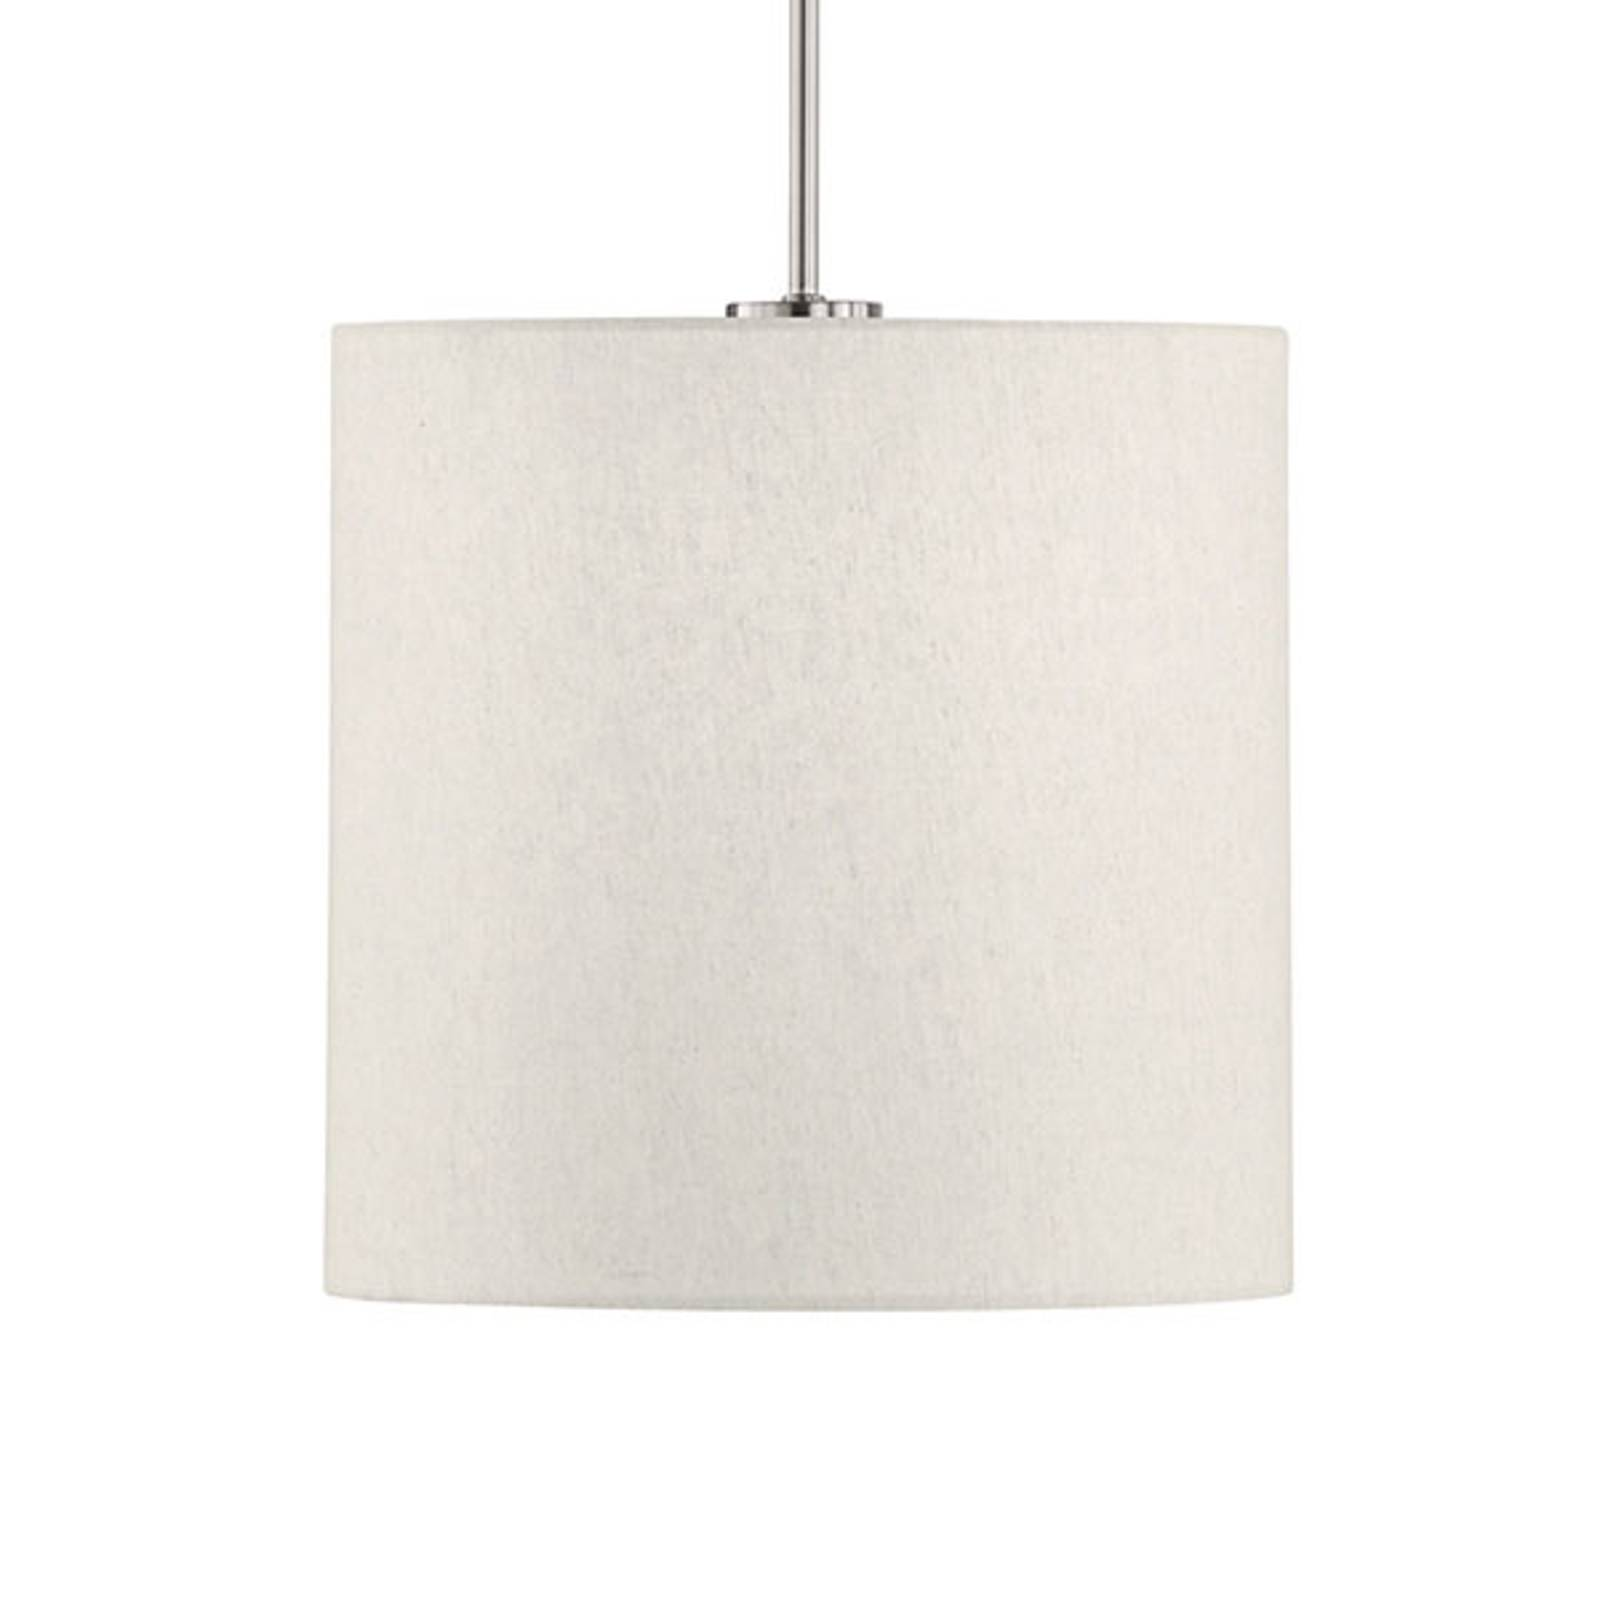 Hanglamp Marie, stoffen kap, zand, Ø 30 cm